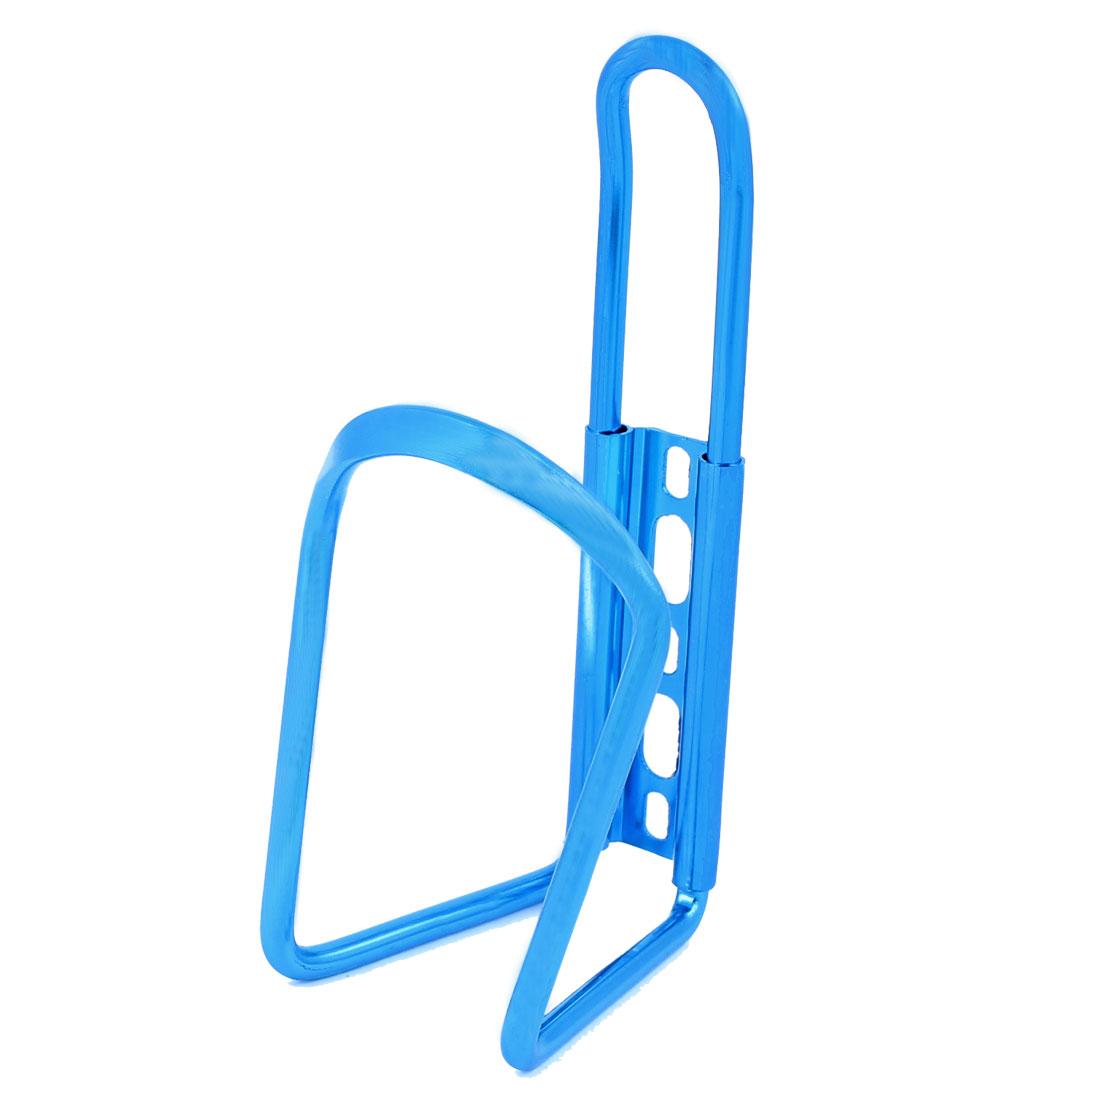 Bike Bicycle Mount Drink Water Carrying Bottle Holder Cage Dodger Blue